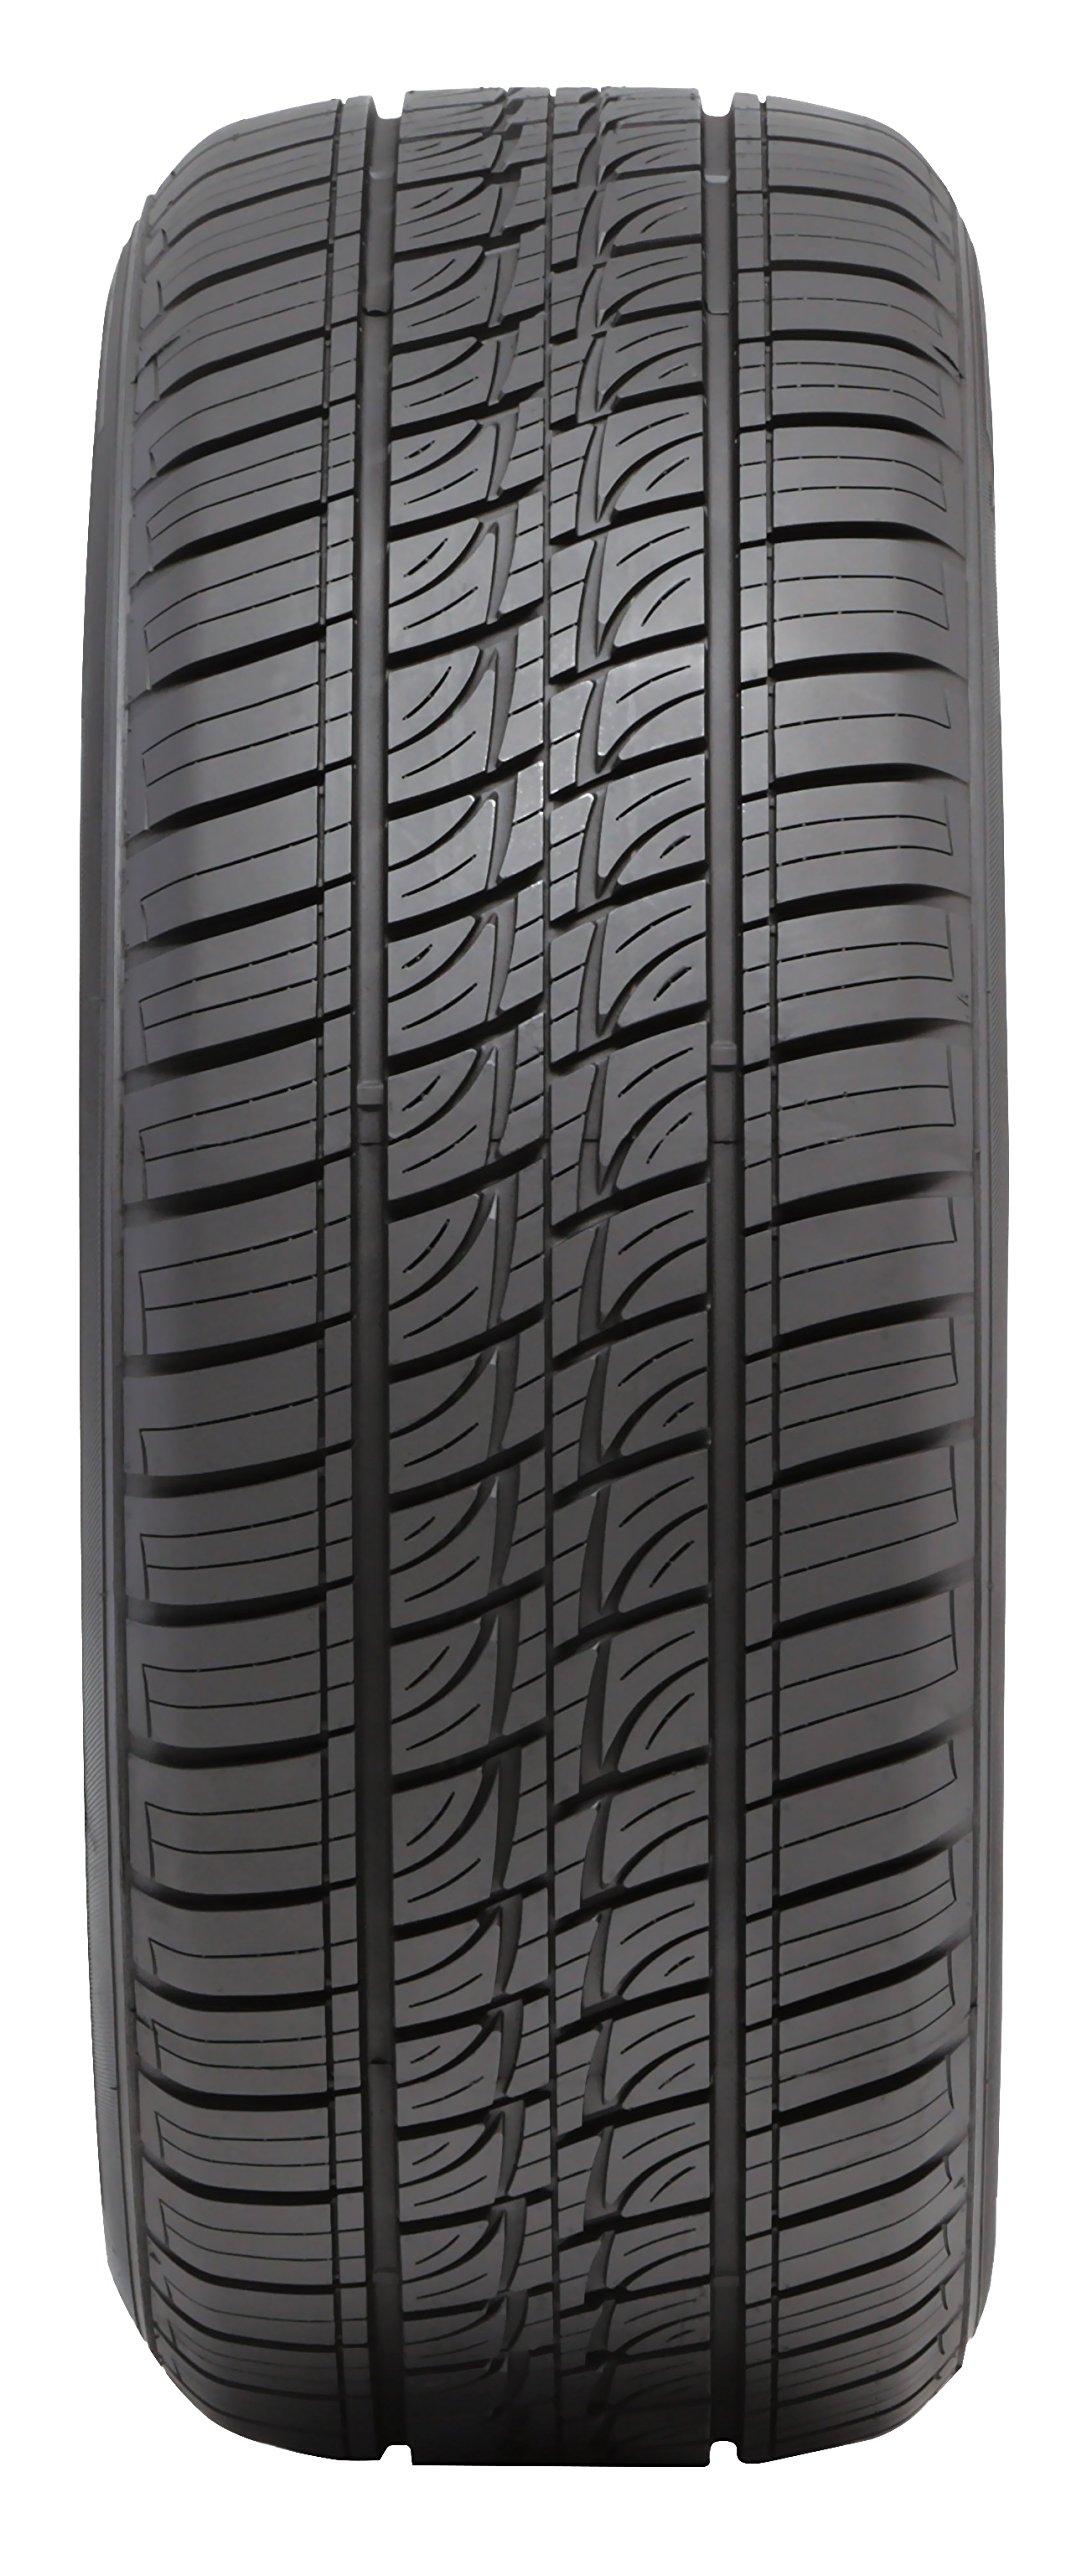 Vercelli Strada III All-Season Radial Tire - 235/55R18 100H by Vercelli (Image #3)